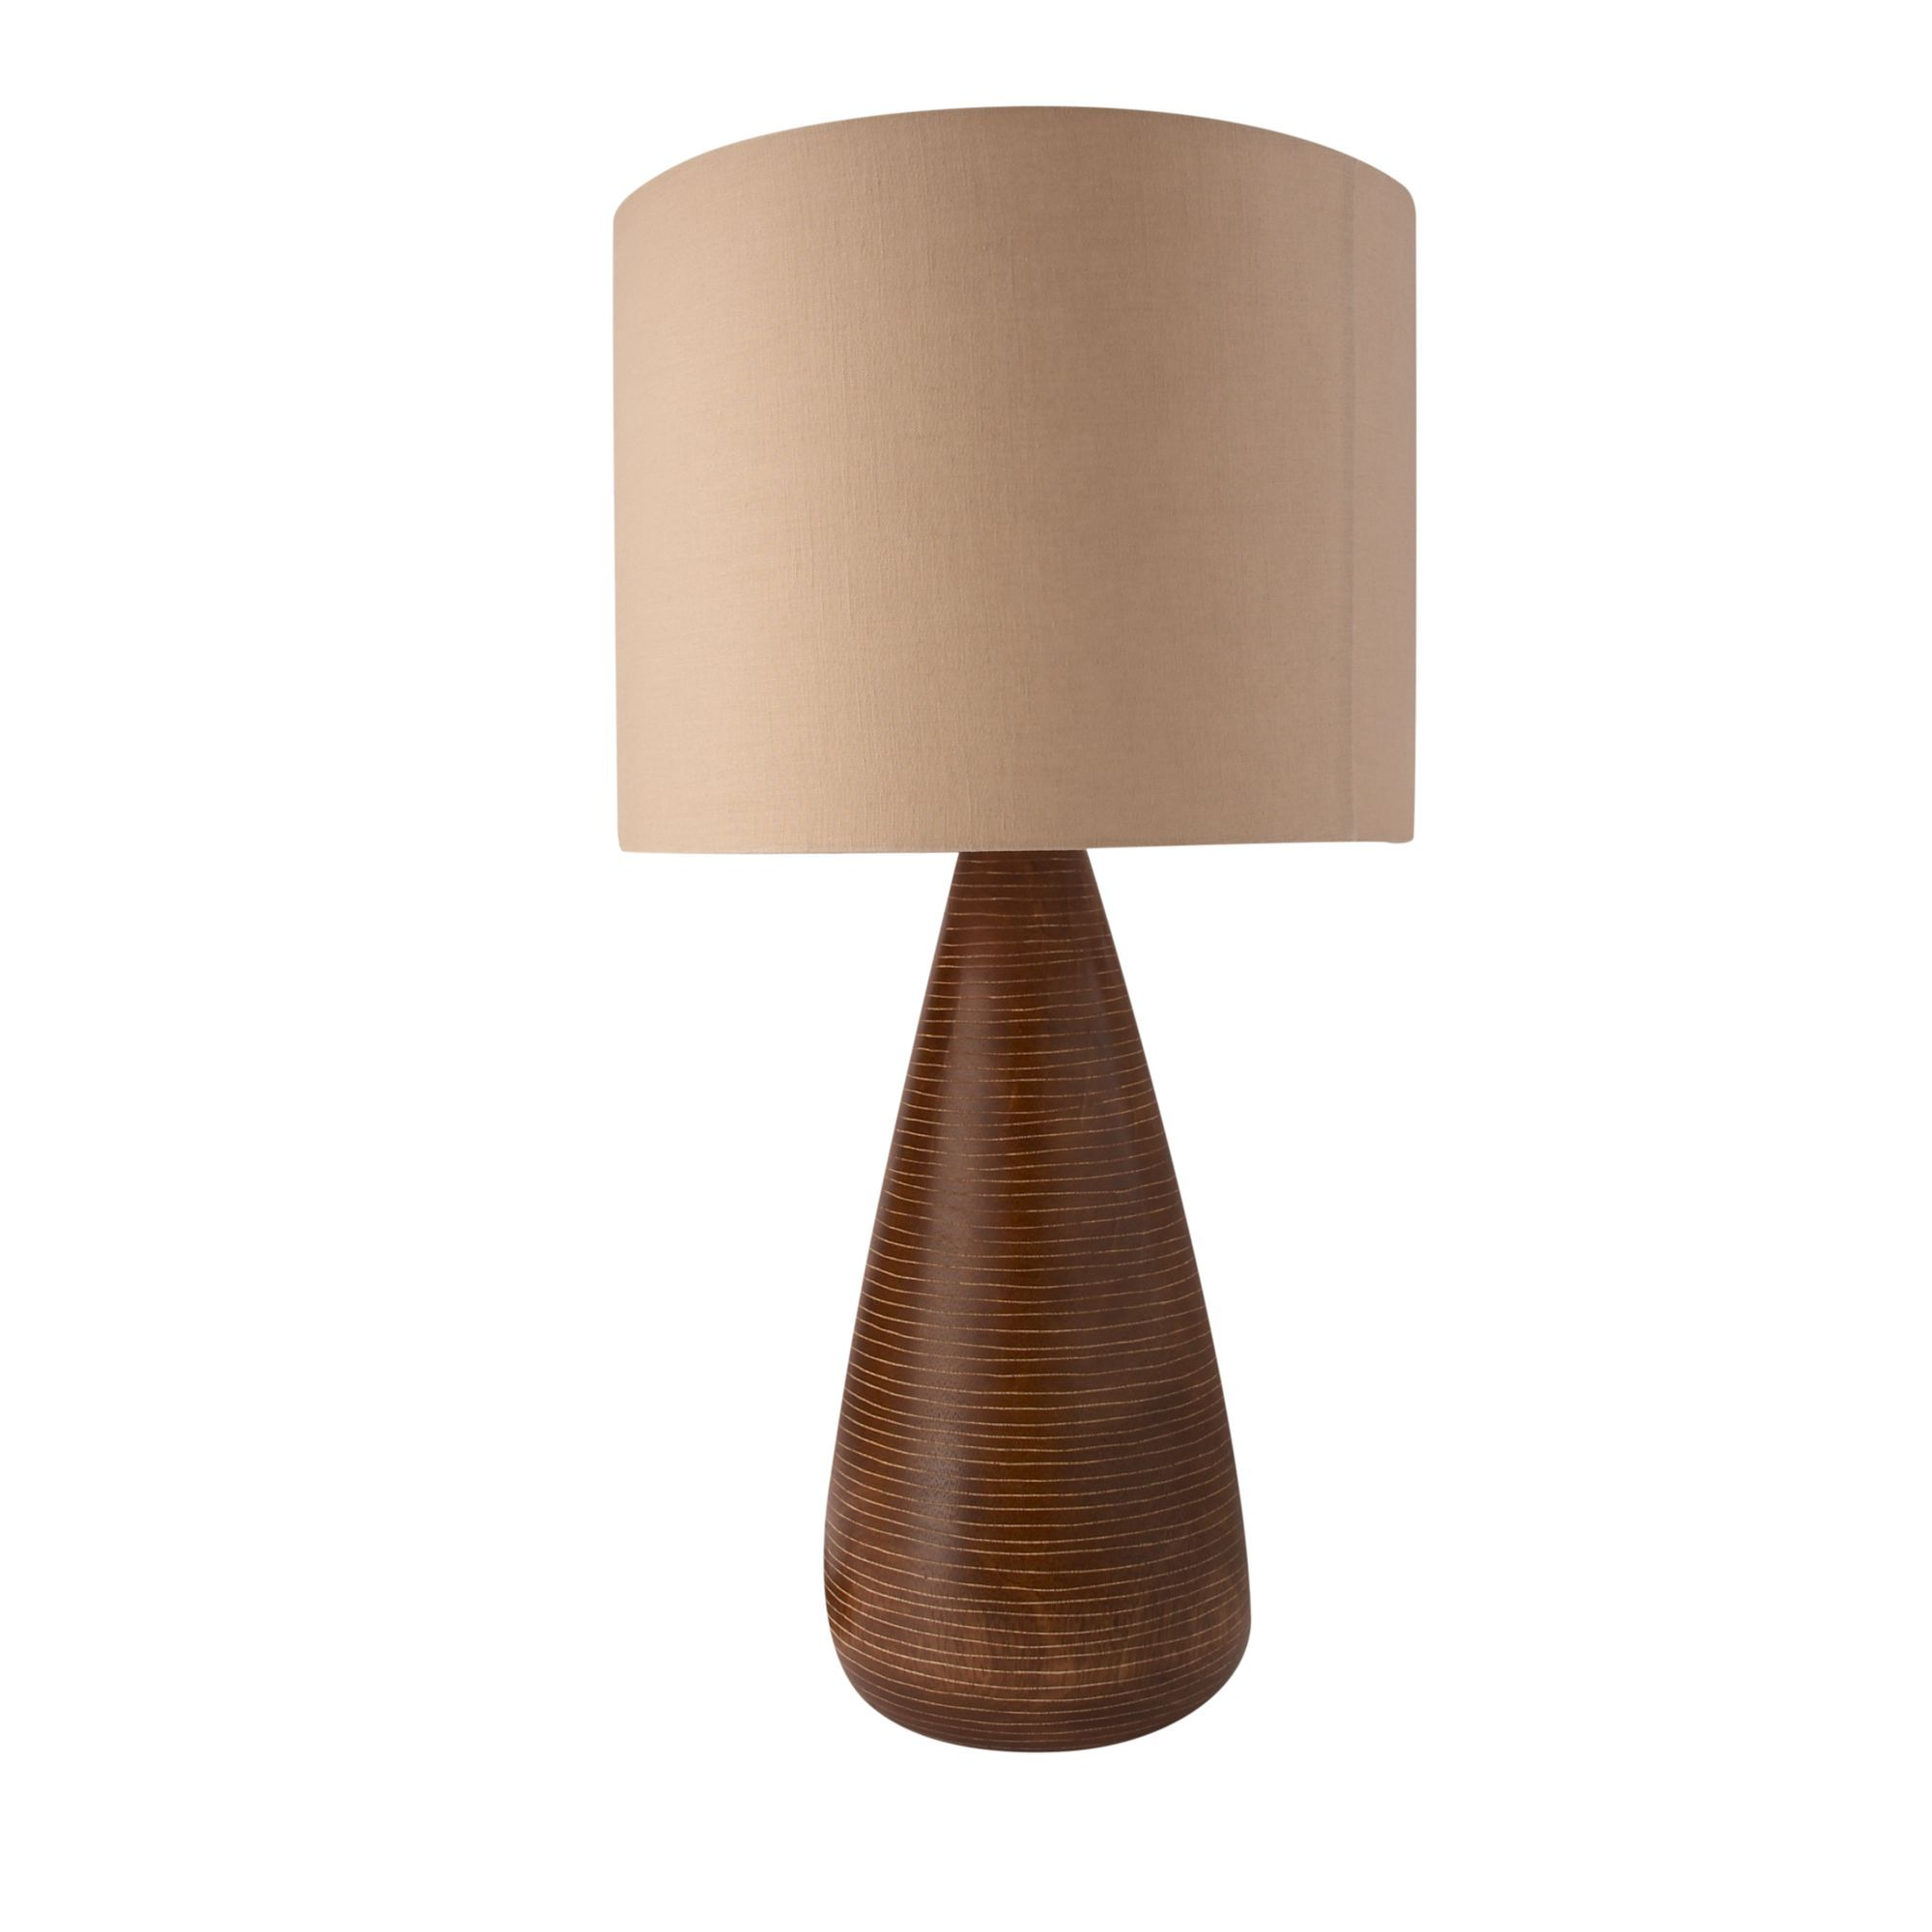 Attrayant Linea Brew Dark Mango Wood Table Lamp